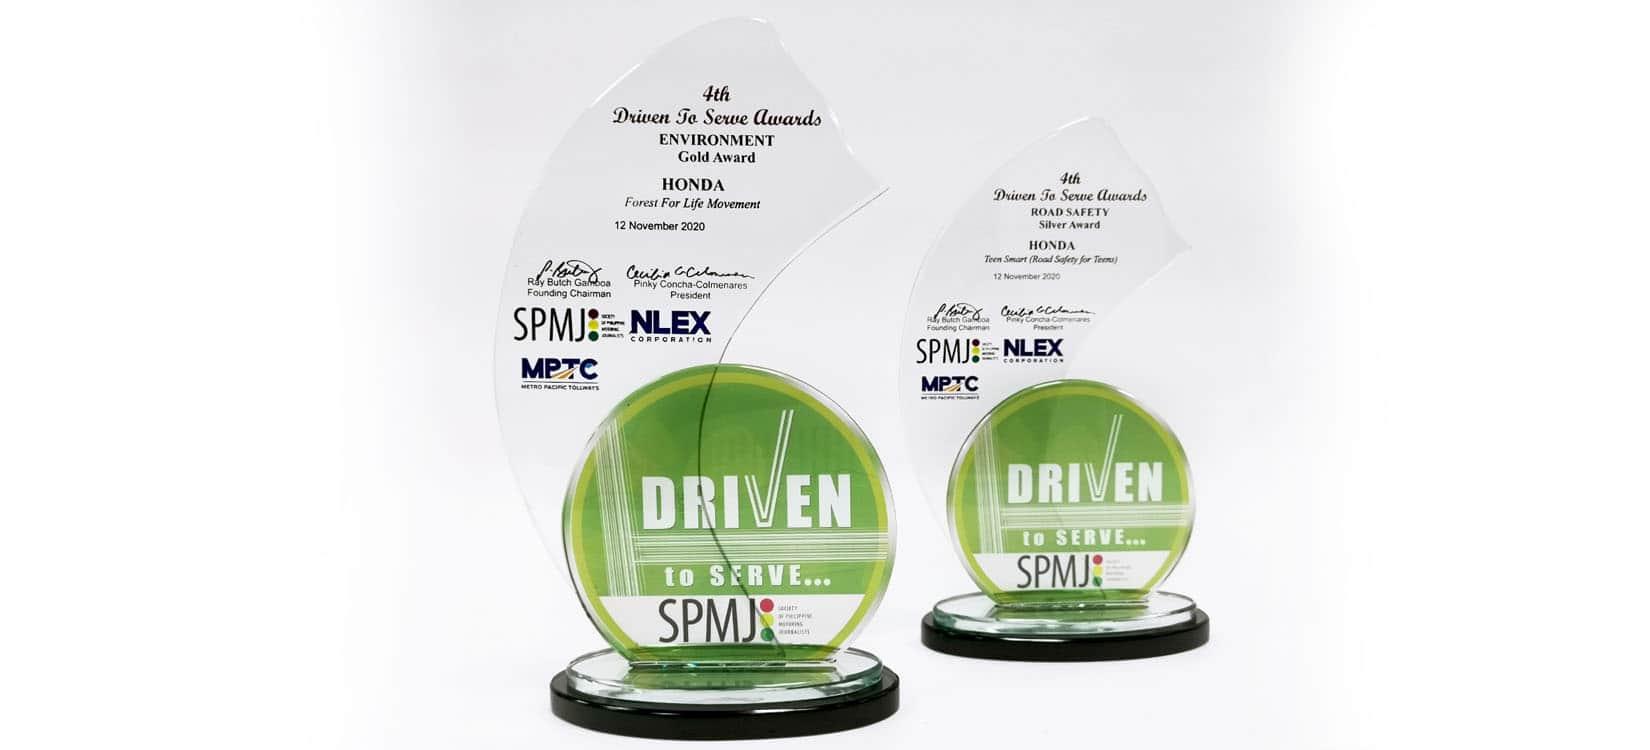 Honda's CSR efforts recognized at 4th SPMJ 'Driven to Serve' awards